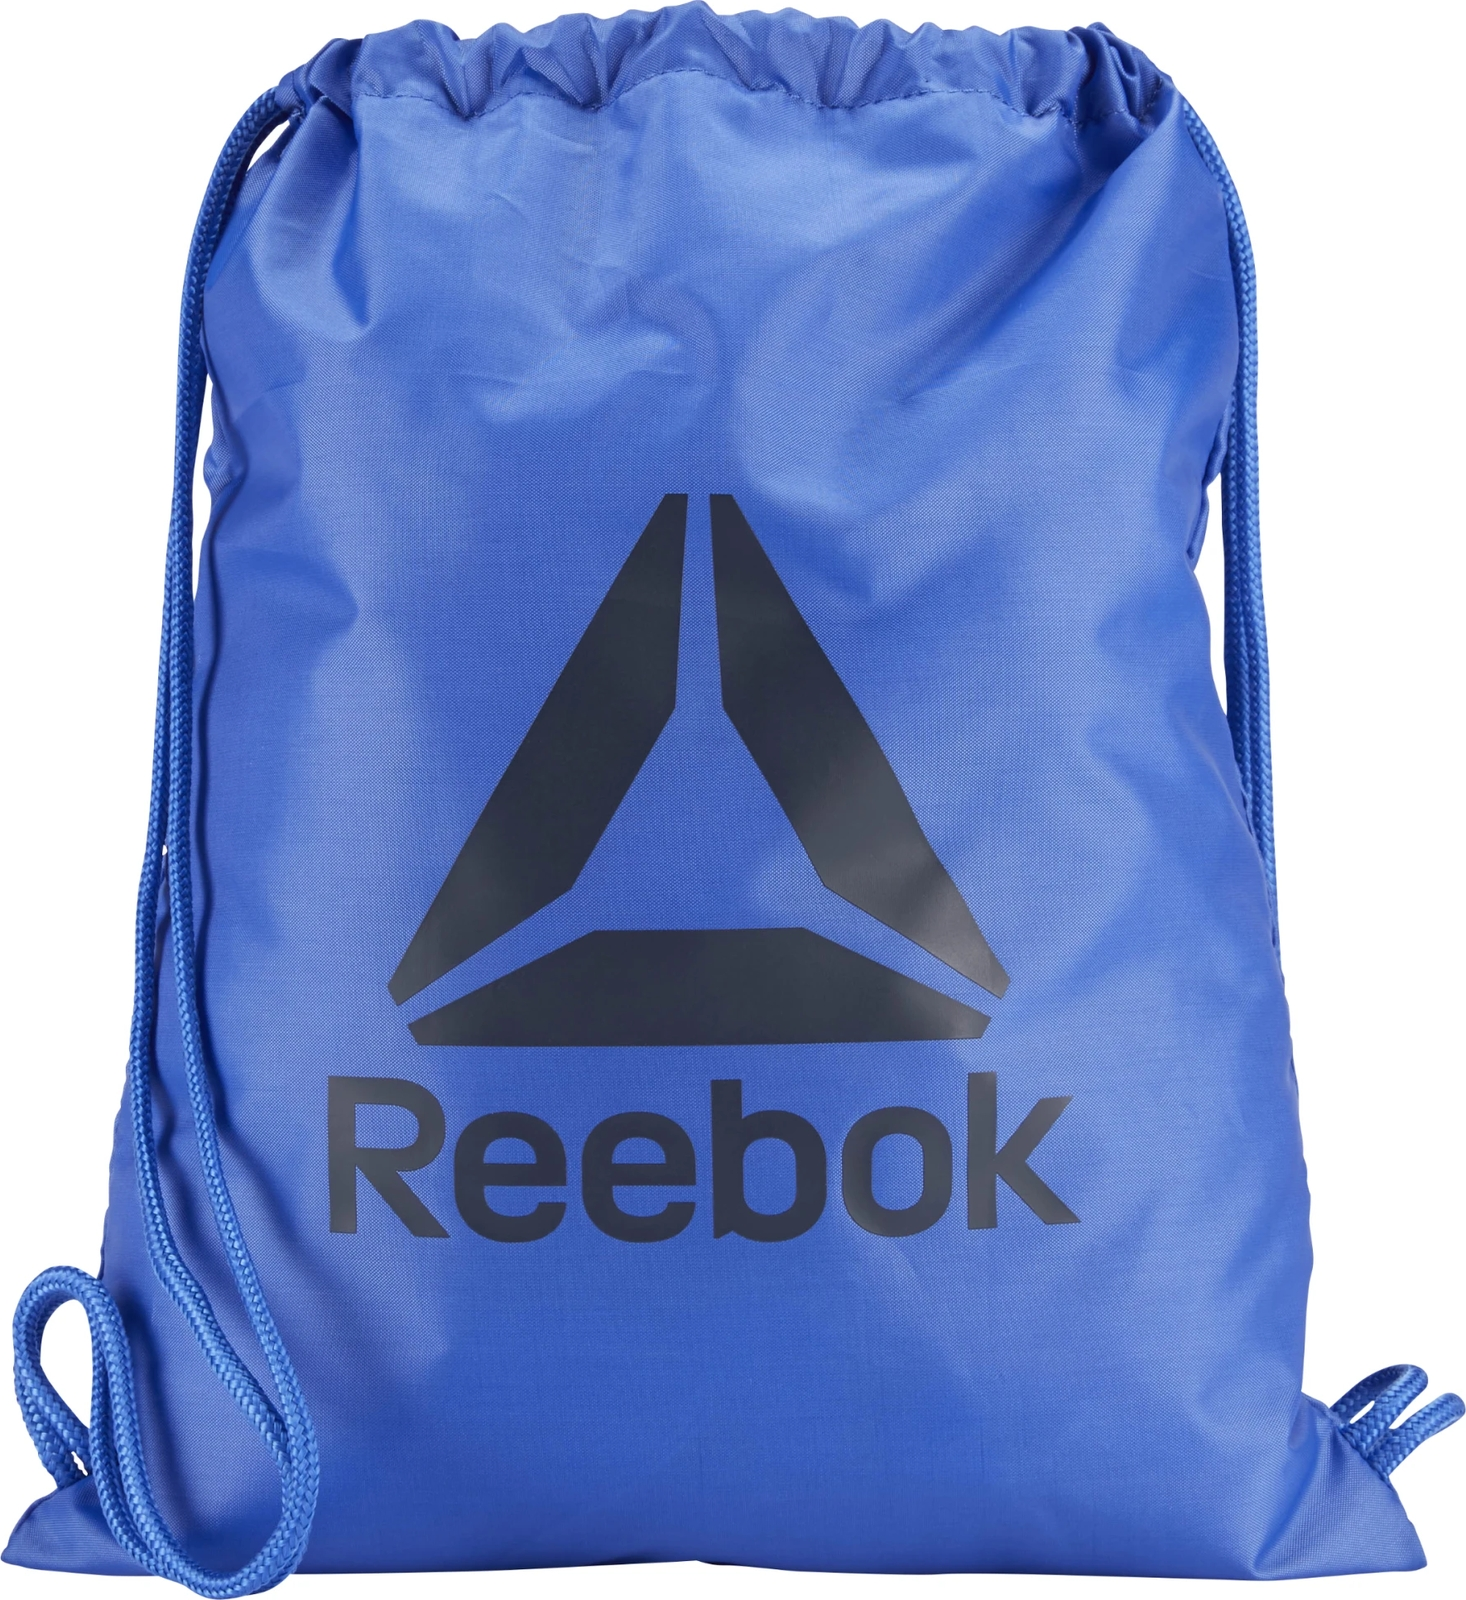 Рюкзак Reebok Act Fon Gymsack, DU2975, ярко-синий рюкзак мешок nike fb gymsack 3 0 ba5094 435